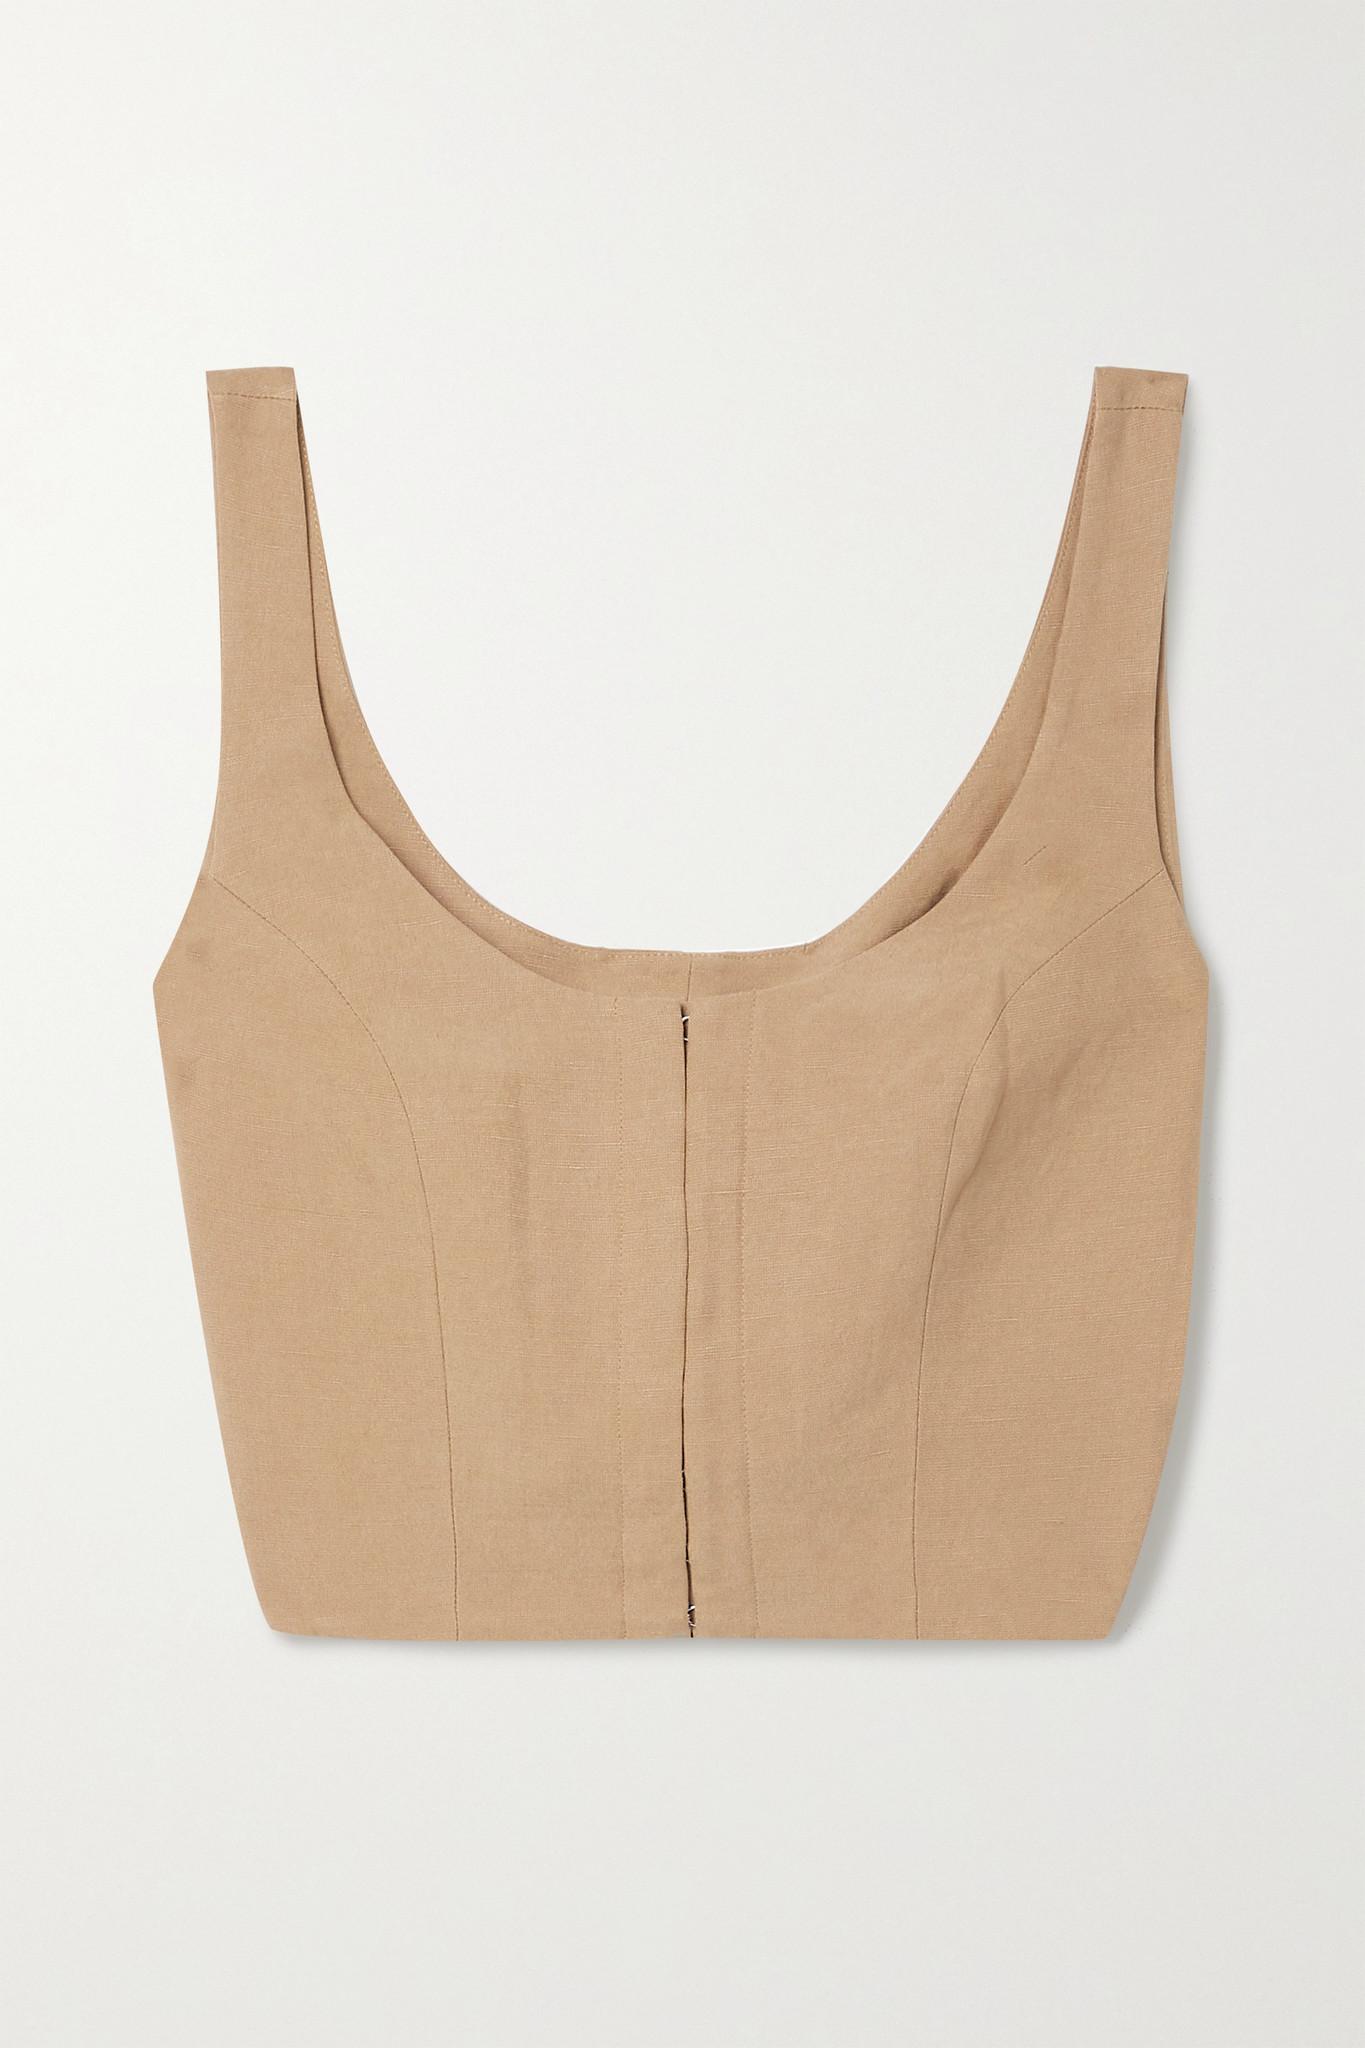 MARA HOFFMAN - 【net Sustain】aisha 天丝亚麻混纺短款上衣 - 棕色 - US2